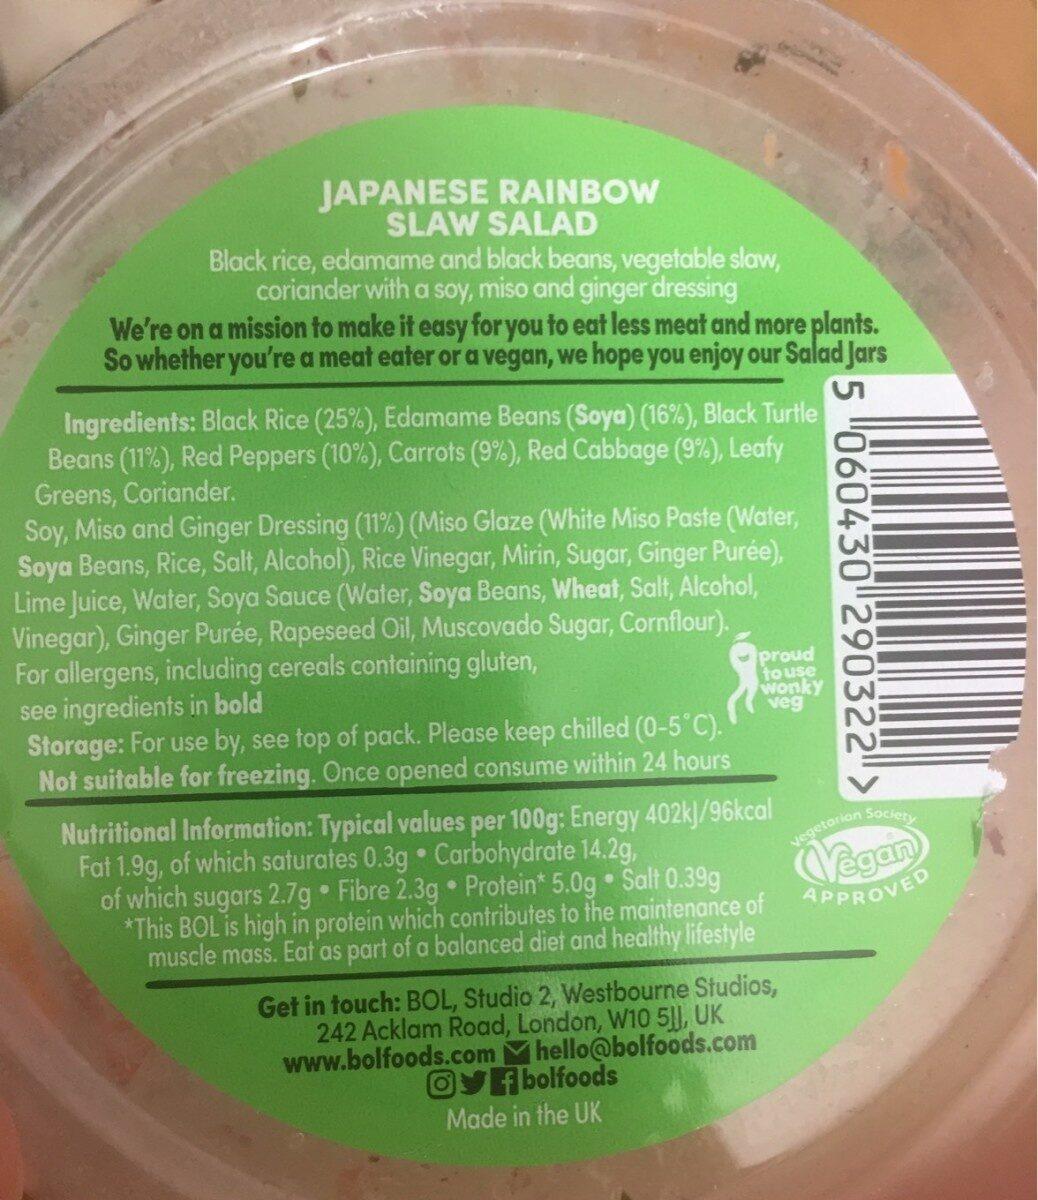 Japanese Rainbow Slaw salad - Nutrition facts